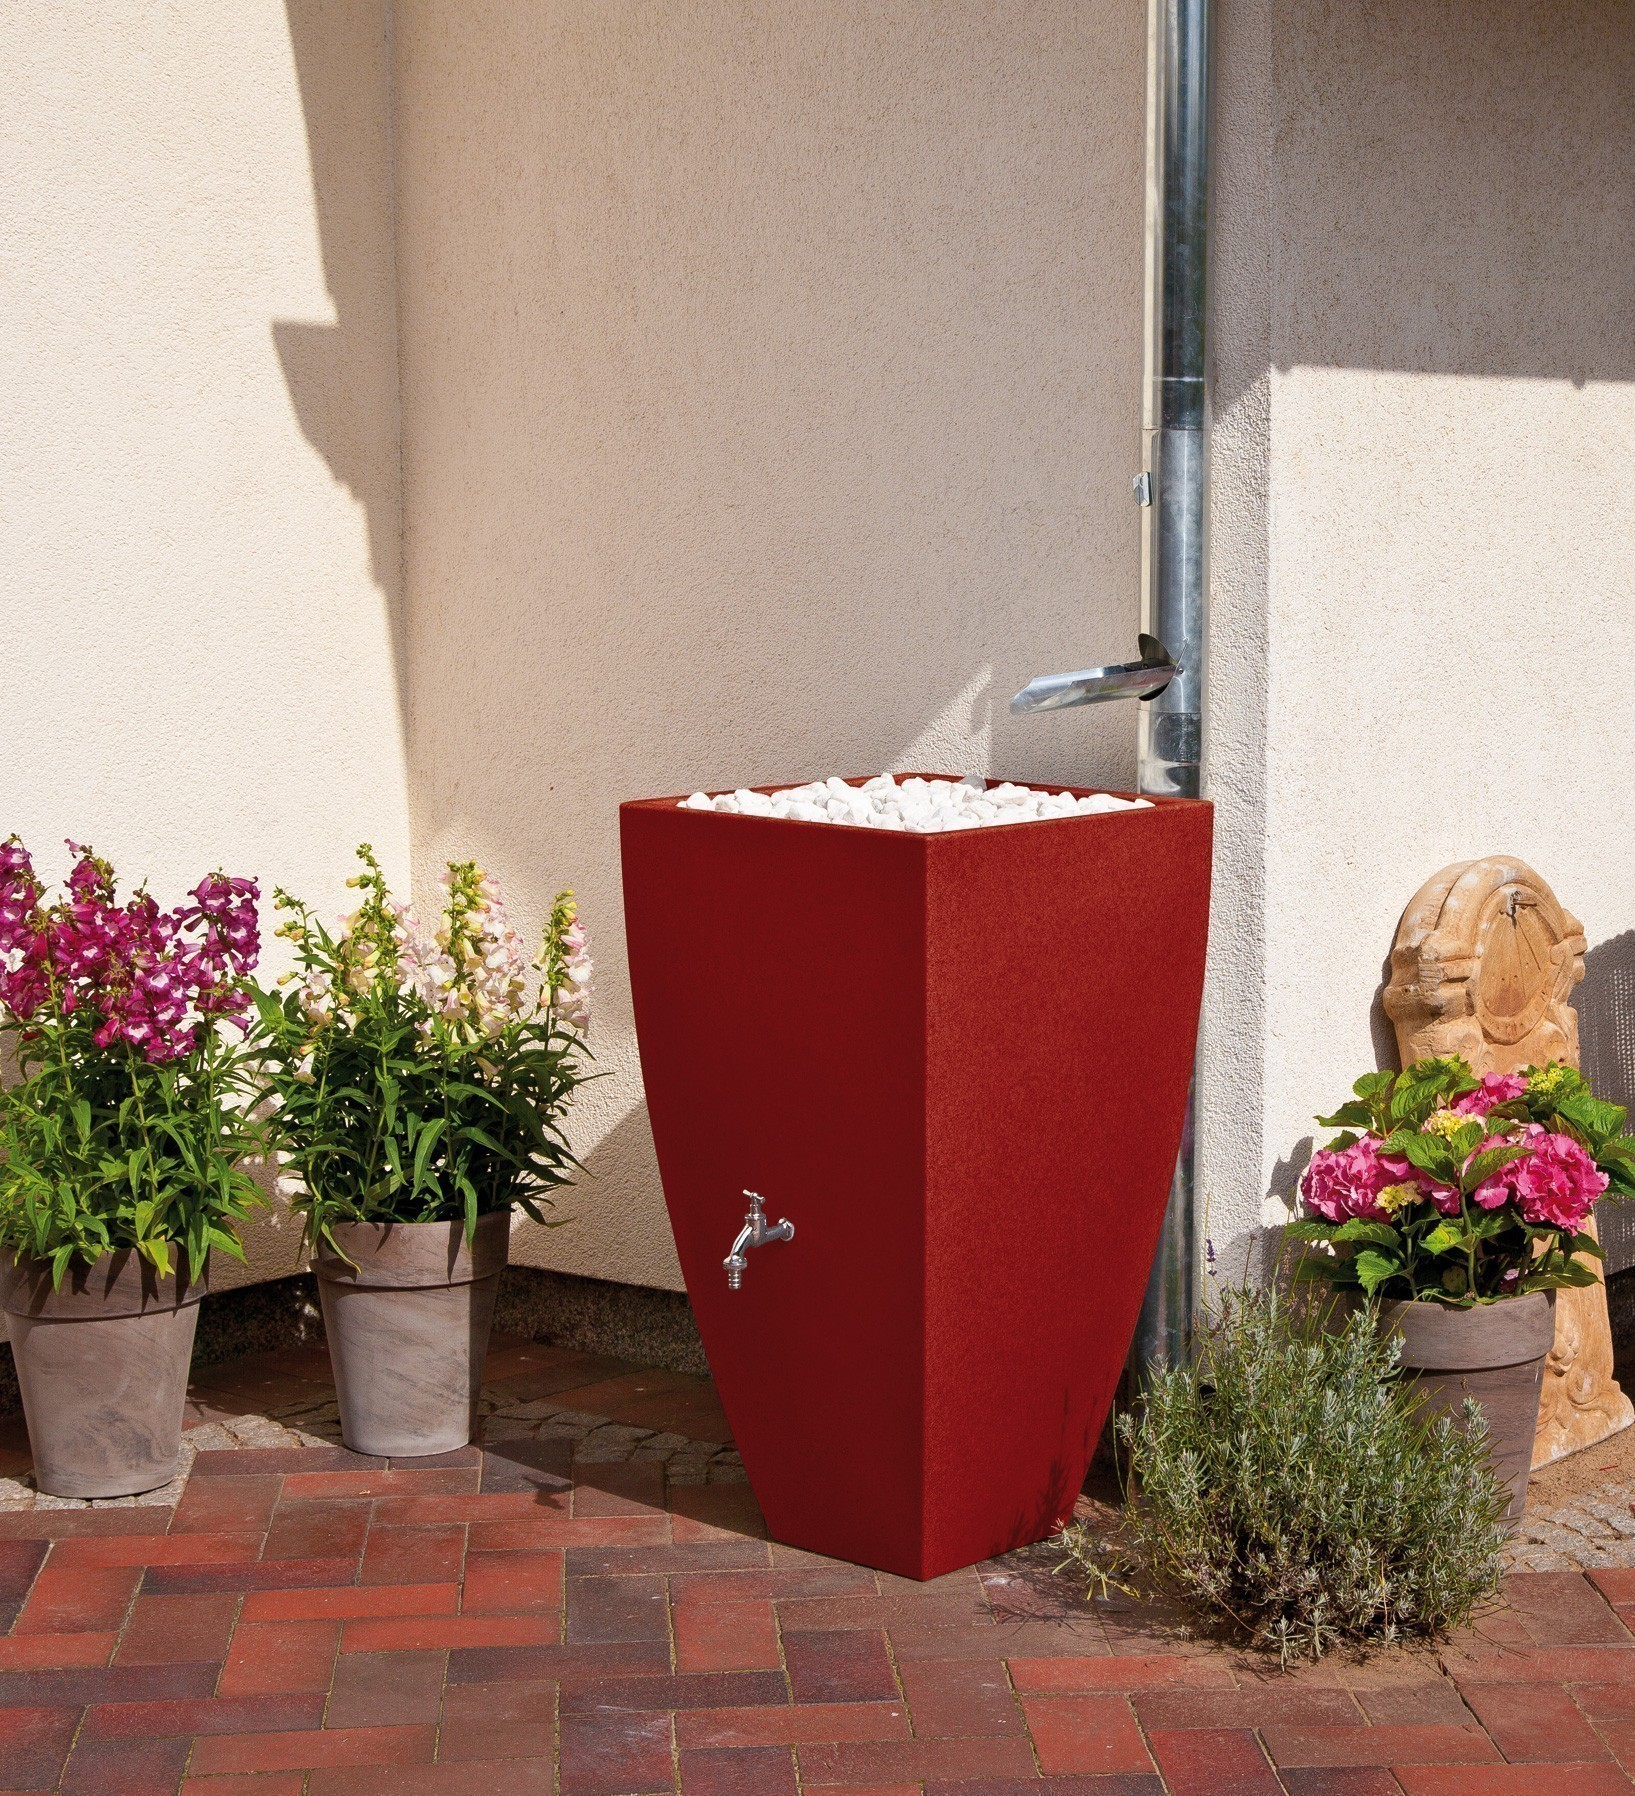 Regentonne / Regenwassertank Premier Tech Aqua Modena 350L rubinrot Bild 1